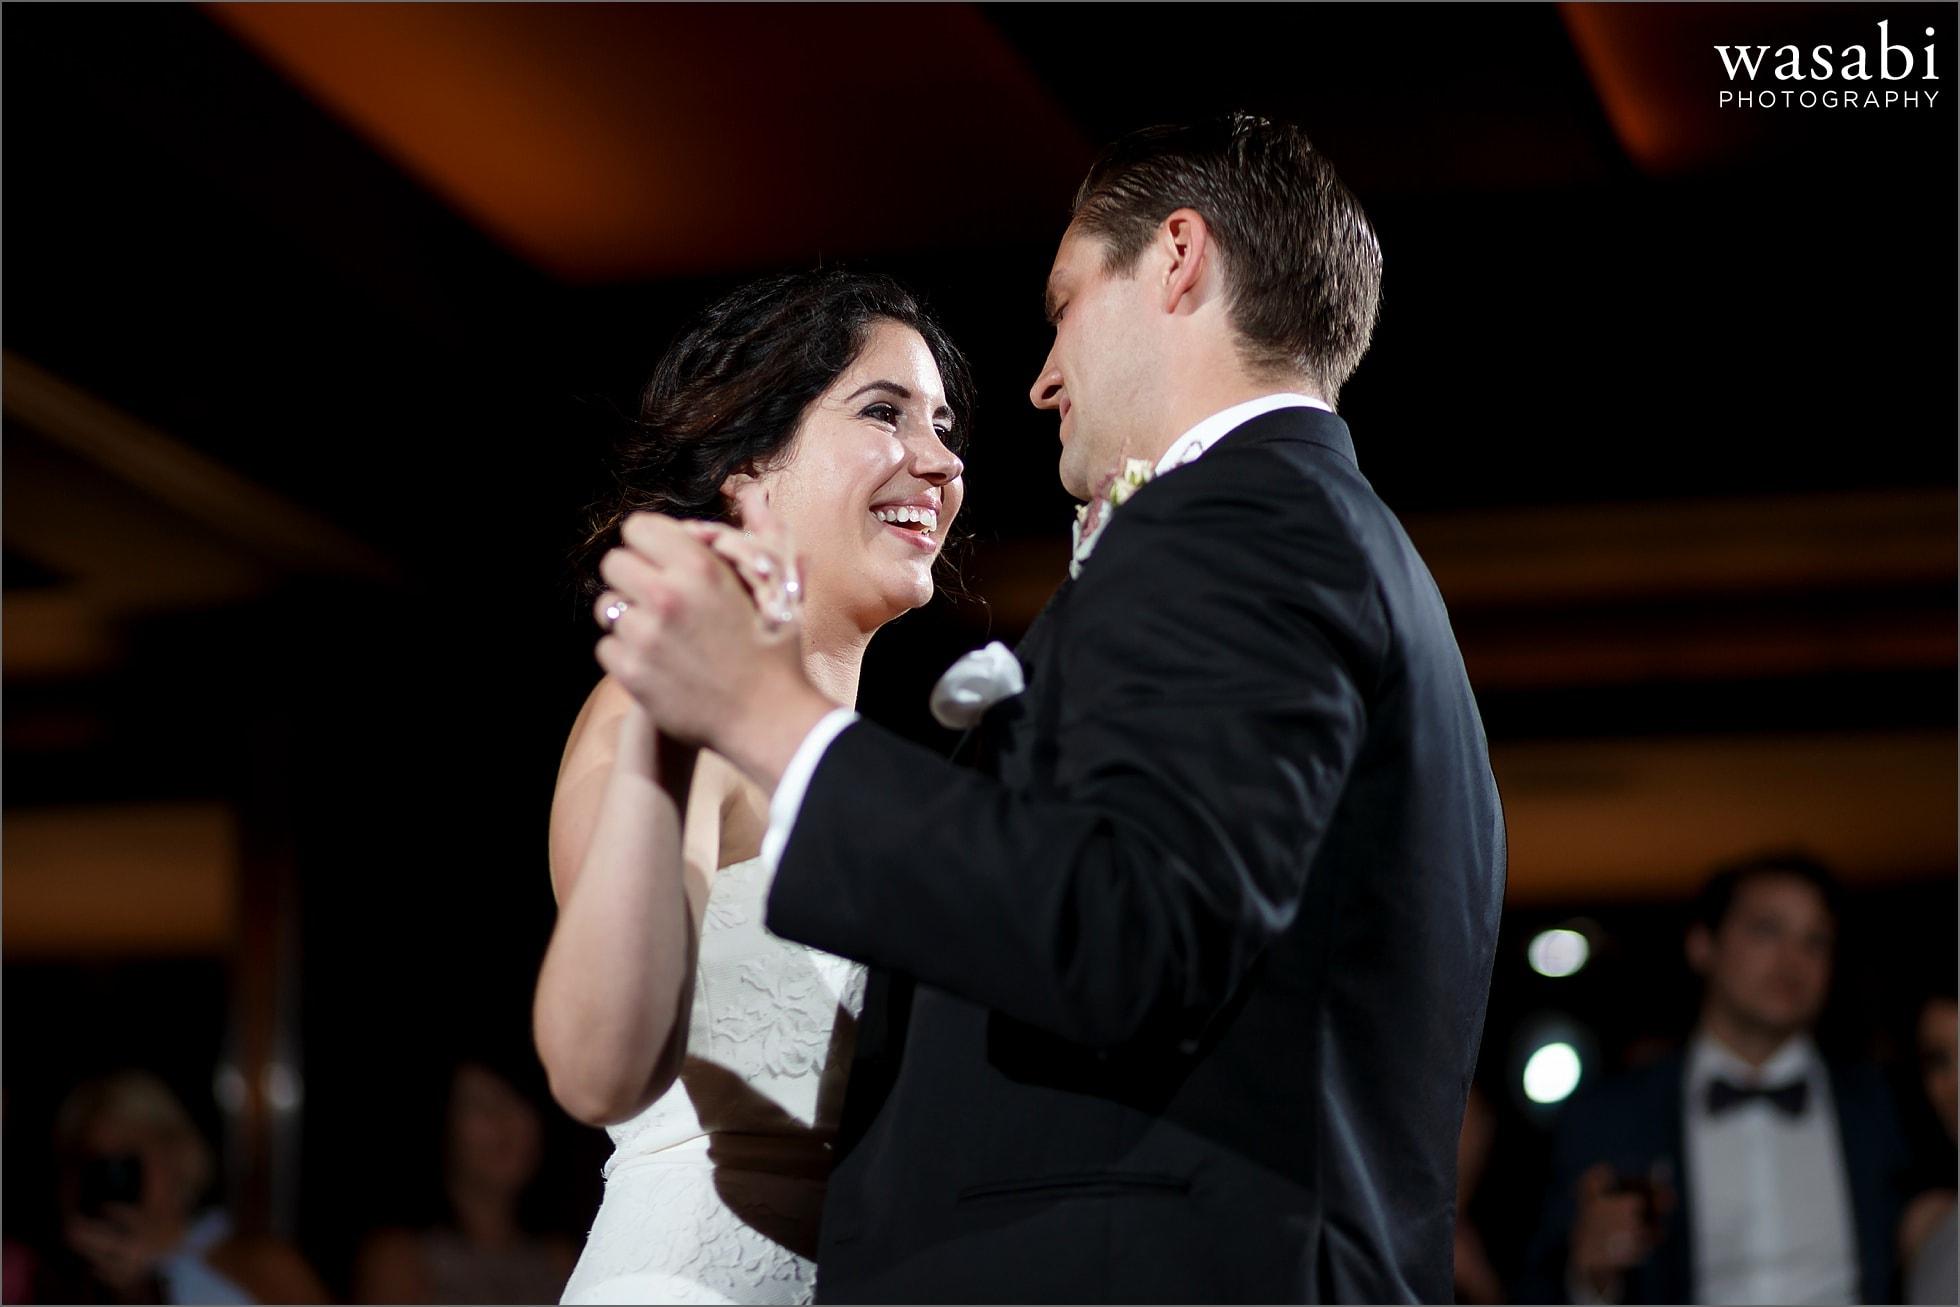 tribune tower howells and hood first dances wedding reception